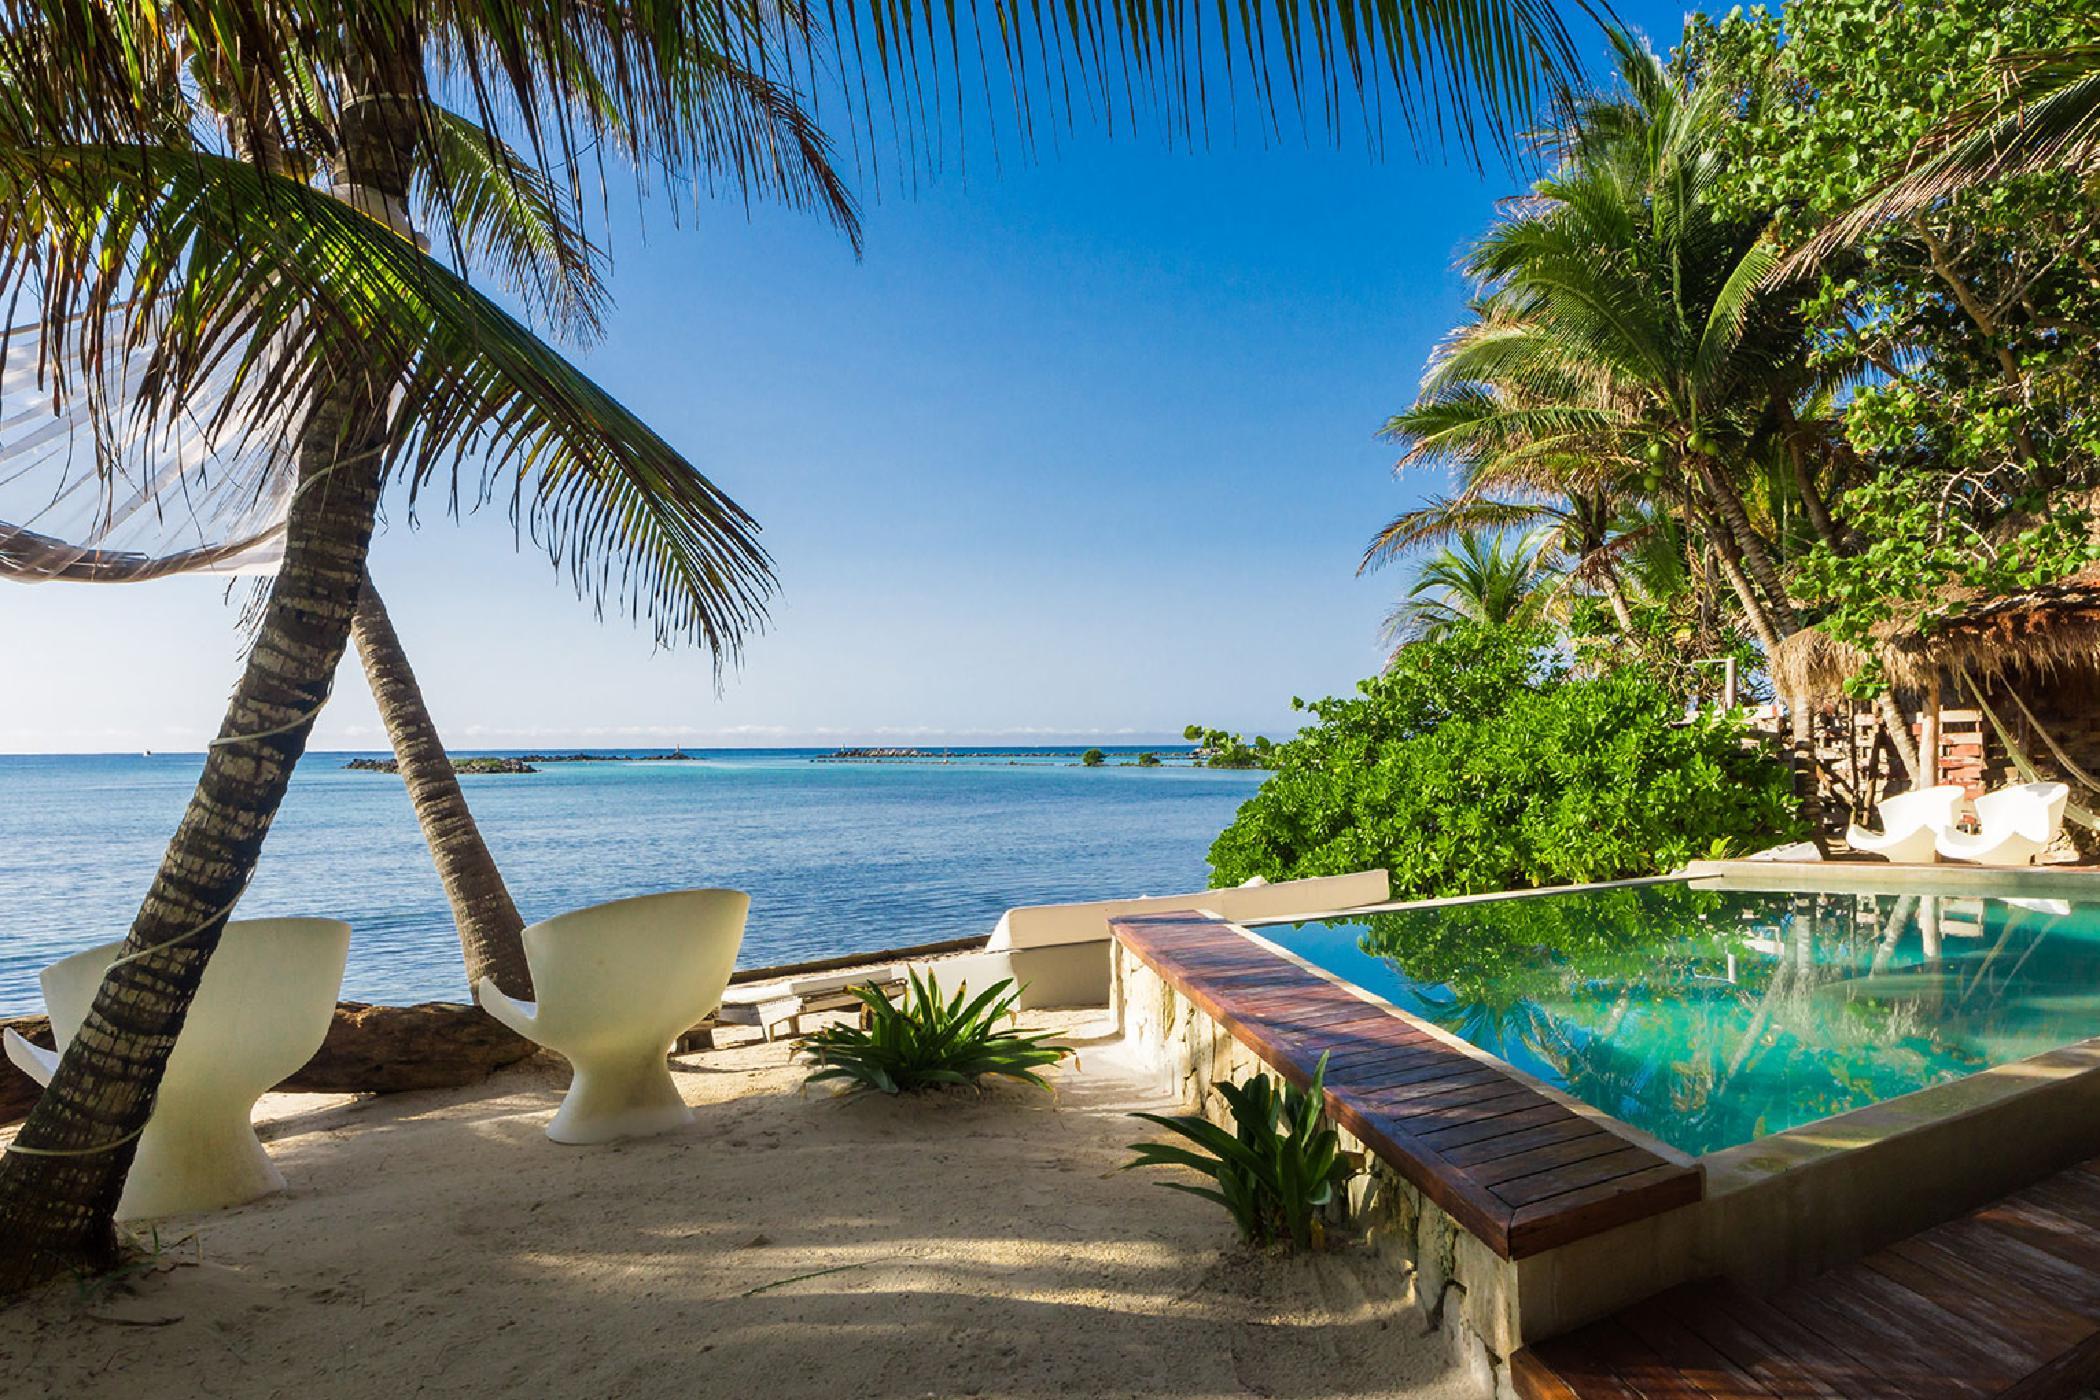 Maya_Luxe_Riviera_Maya_Luxury_Villas_Experiences_Puerto_Aventuras_5_Bedrooms_Zacil_Na_30.jpg